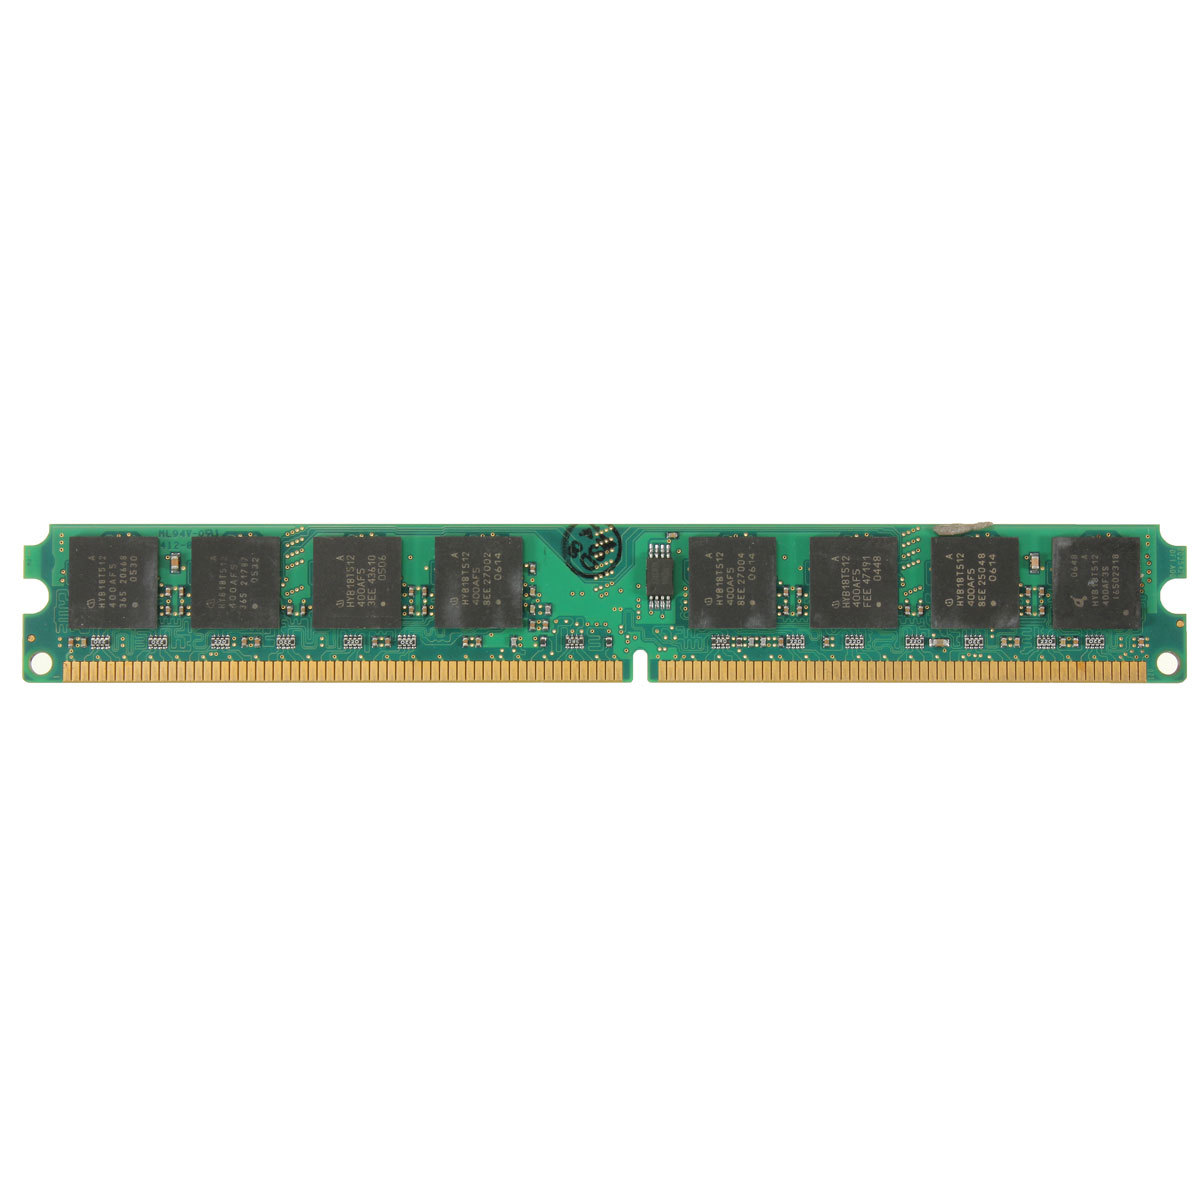 Harga Sdram Laptop Ddr2 512mb Terbaru 2018 Original Baterai Acer V5 471g 431g 531 Al12a32 Ms2360 E1 432 Philippines 1gb Pc2 5300 667mhz Desktop Pc Dimm Memory Ram Non Ecc